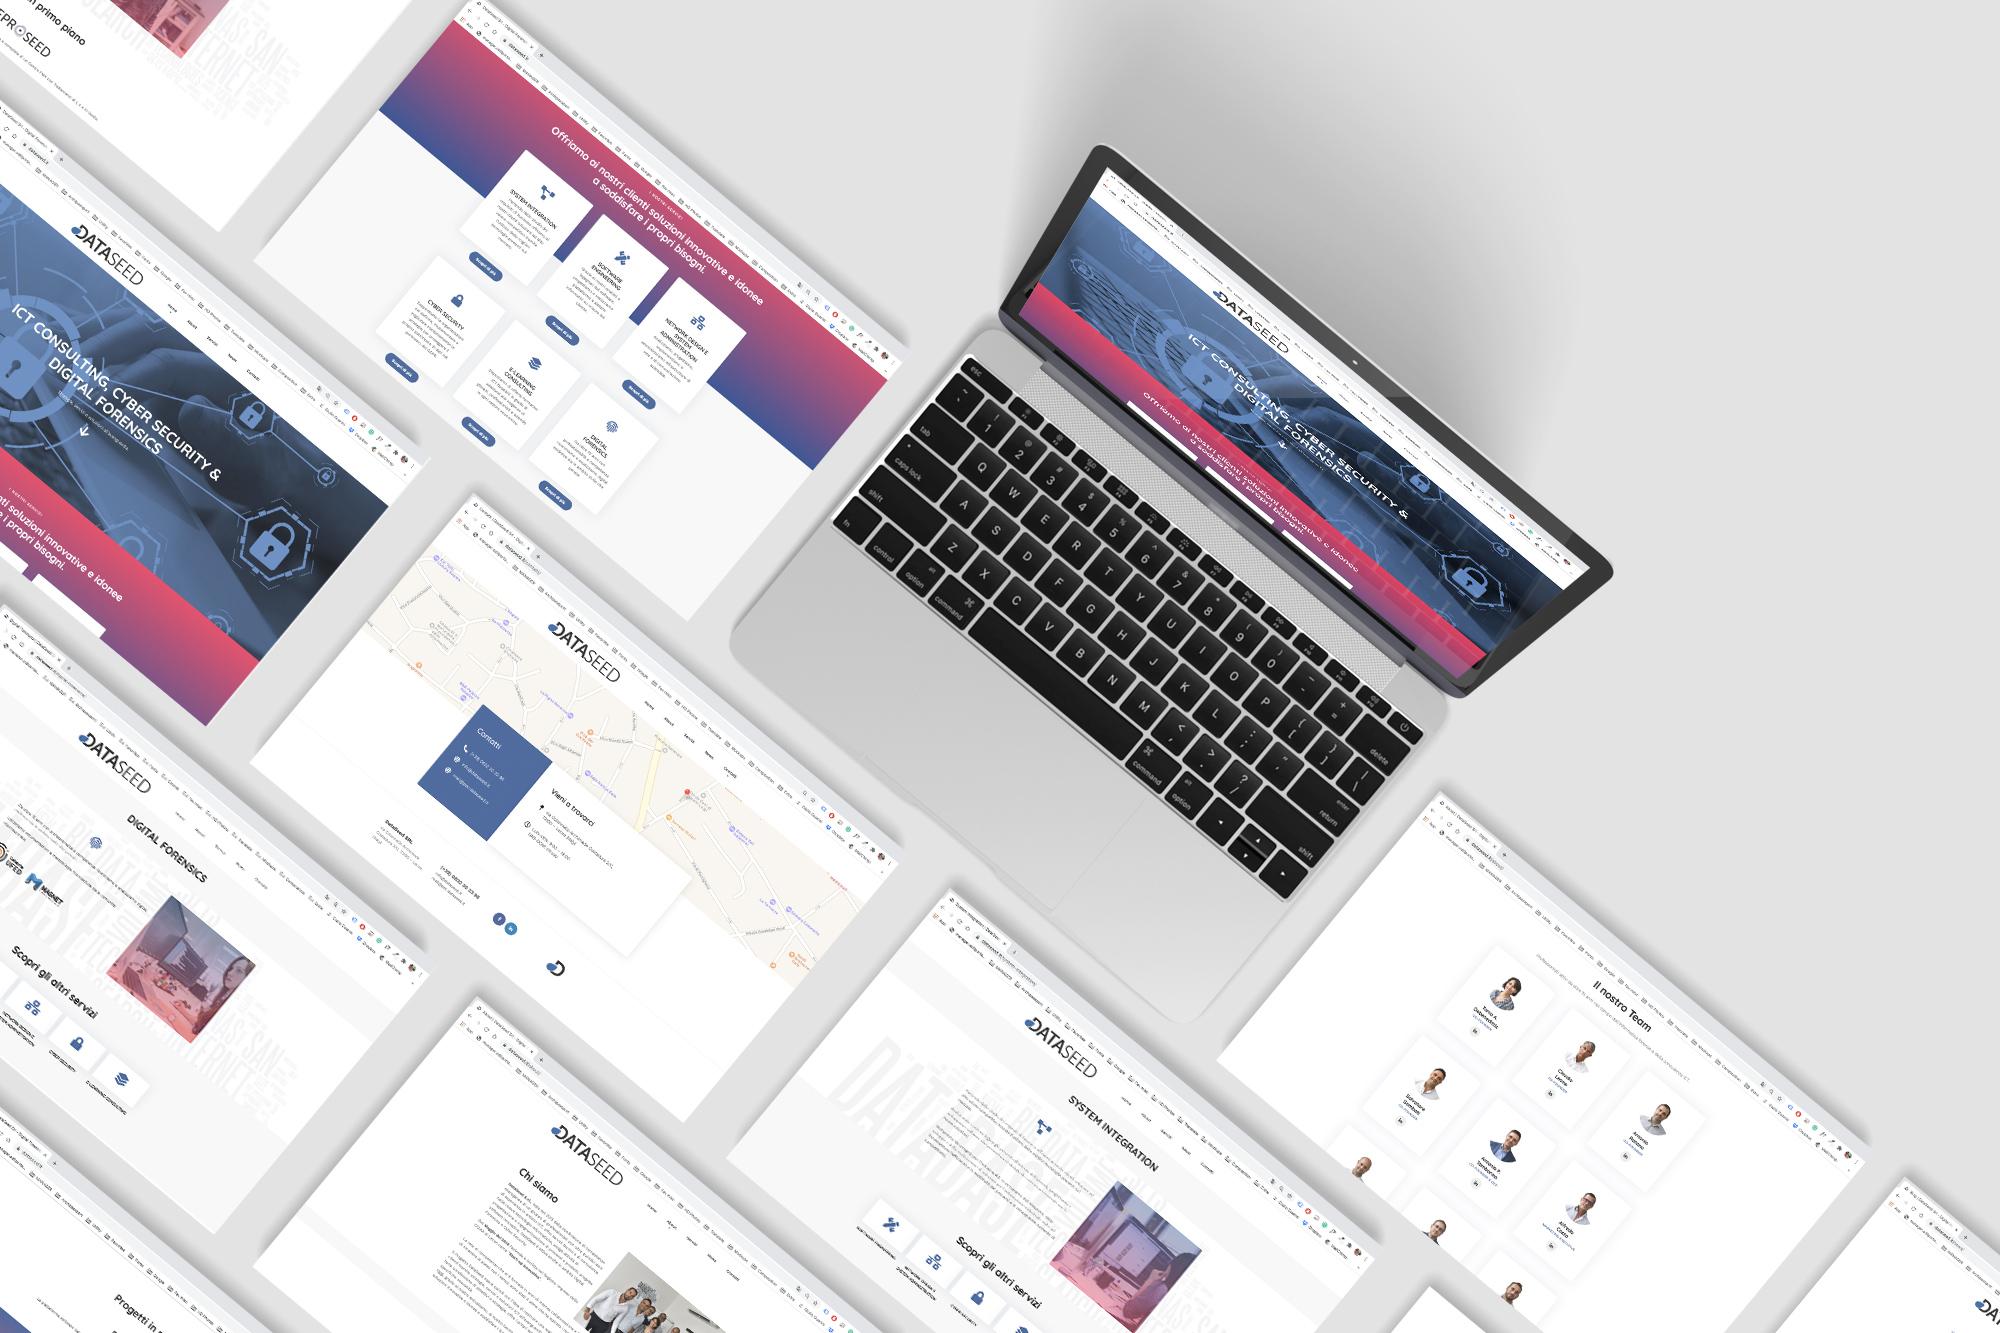 DataSeed - logo, branding, web, print - img 5